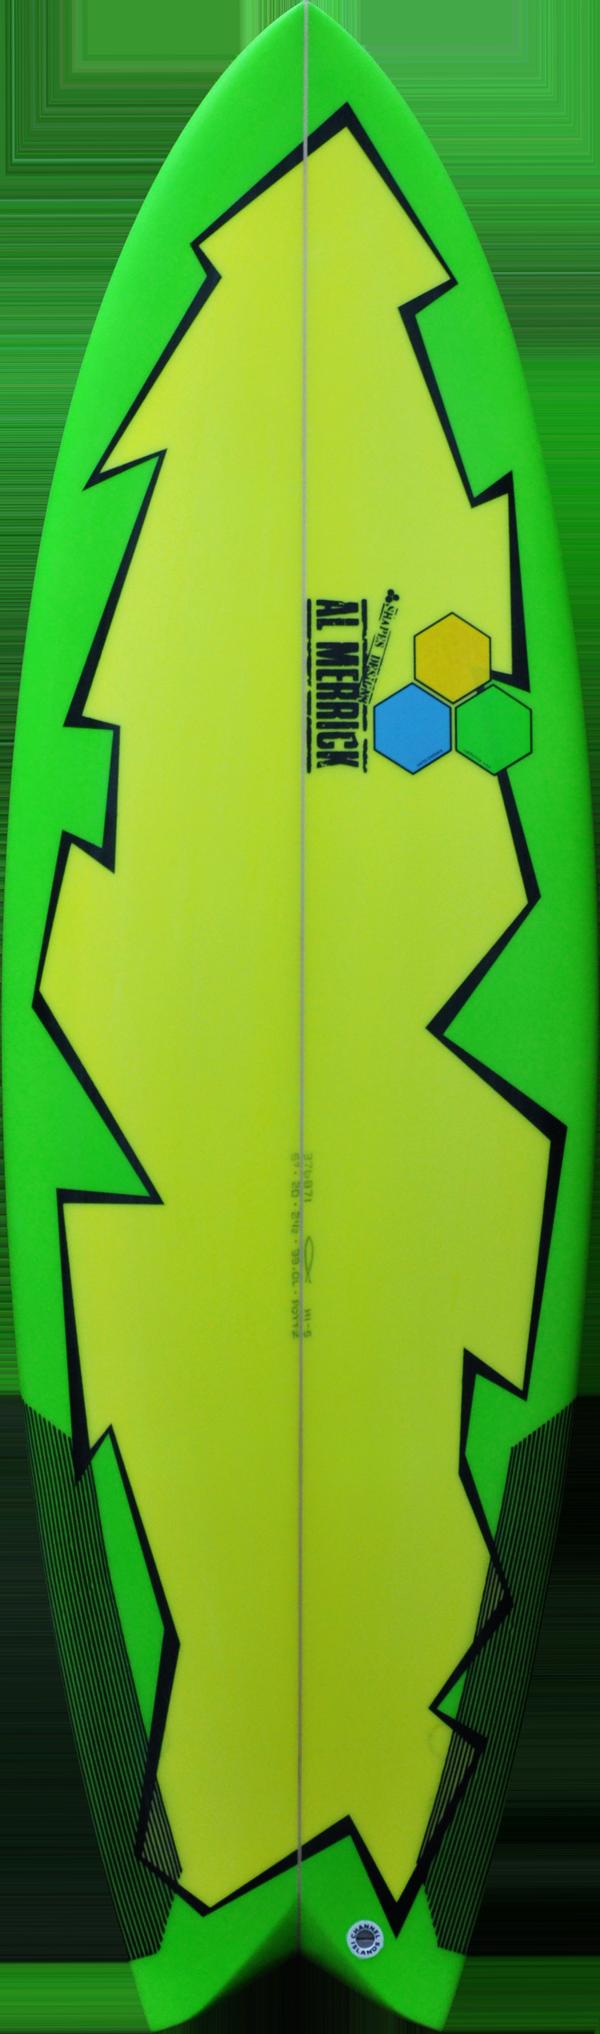 High channel islands surfboards. Green clipart surfboard